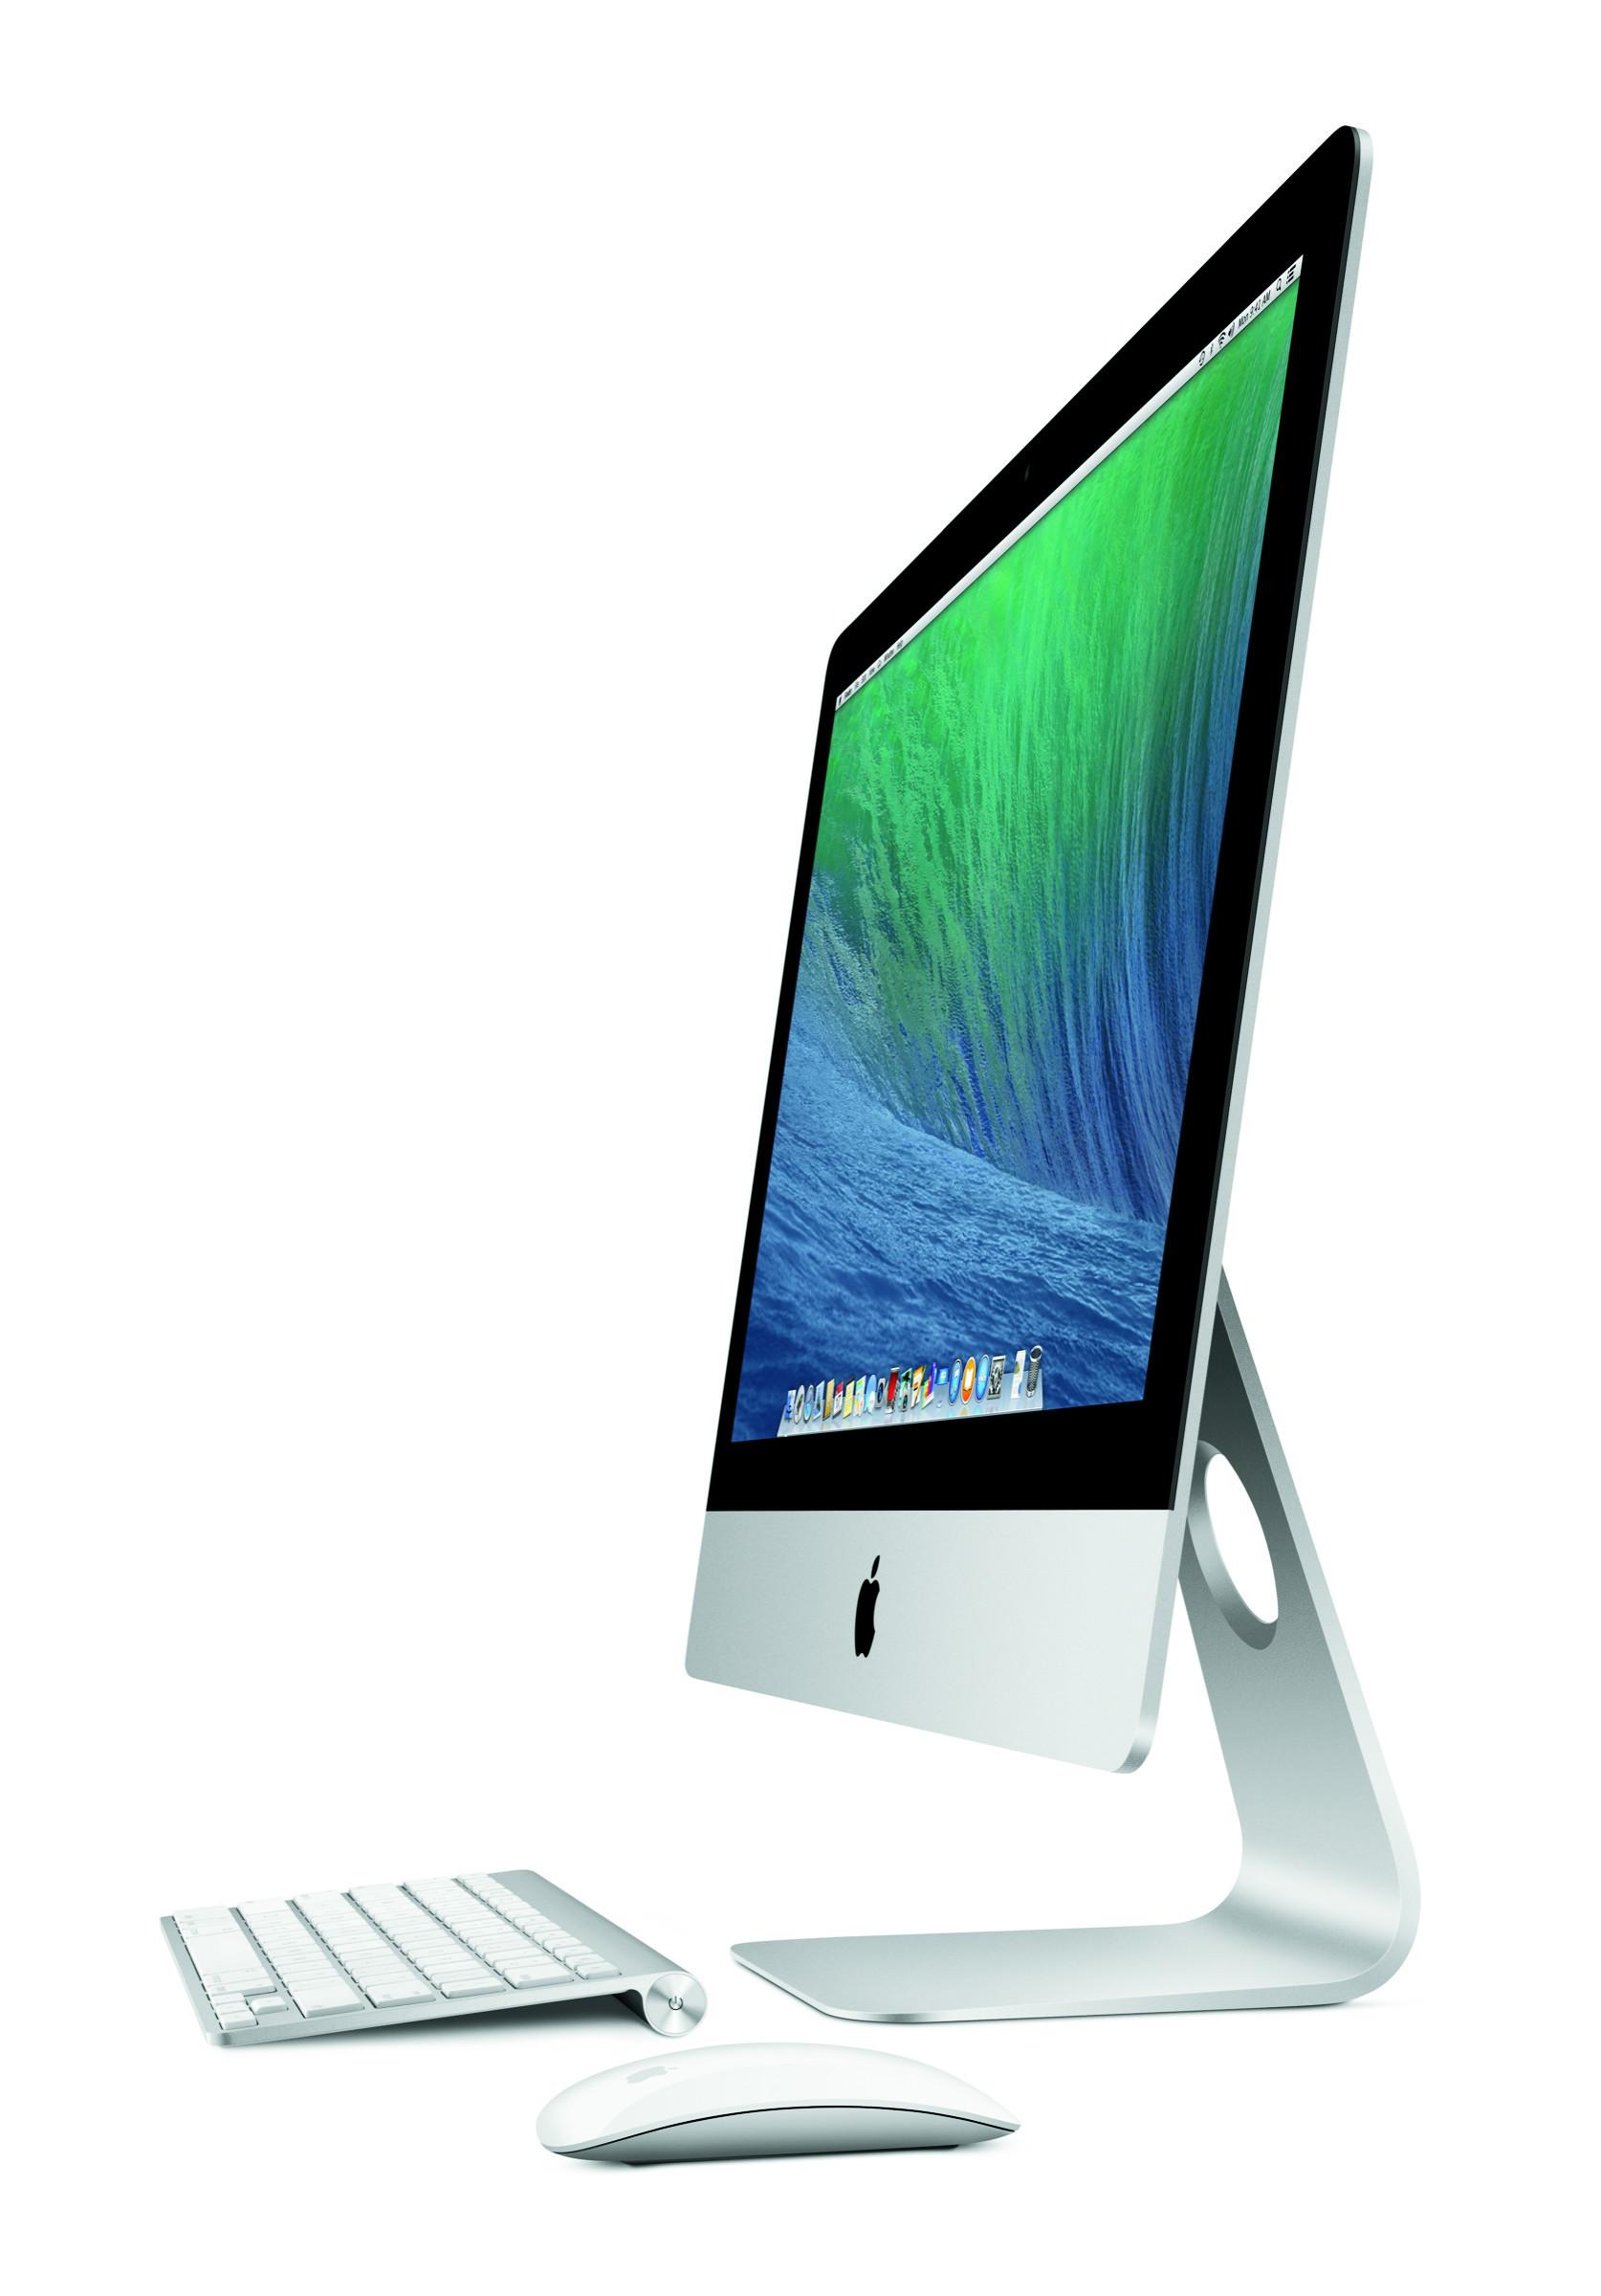 Mid-2014 iMac review: lower price, way lower performance | Macworld